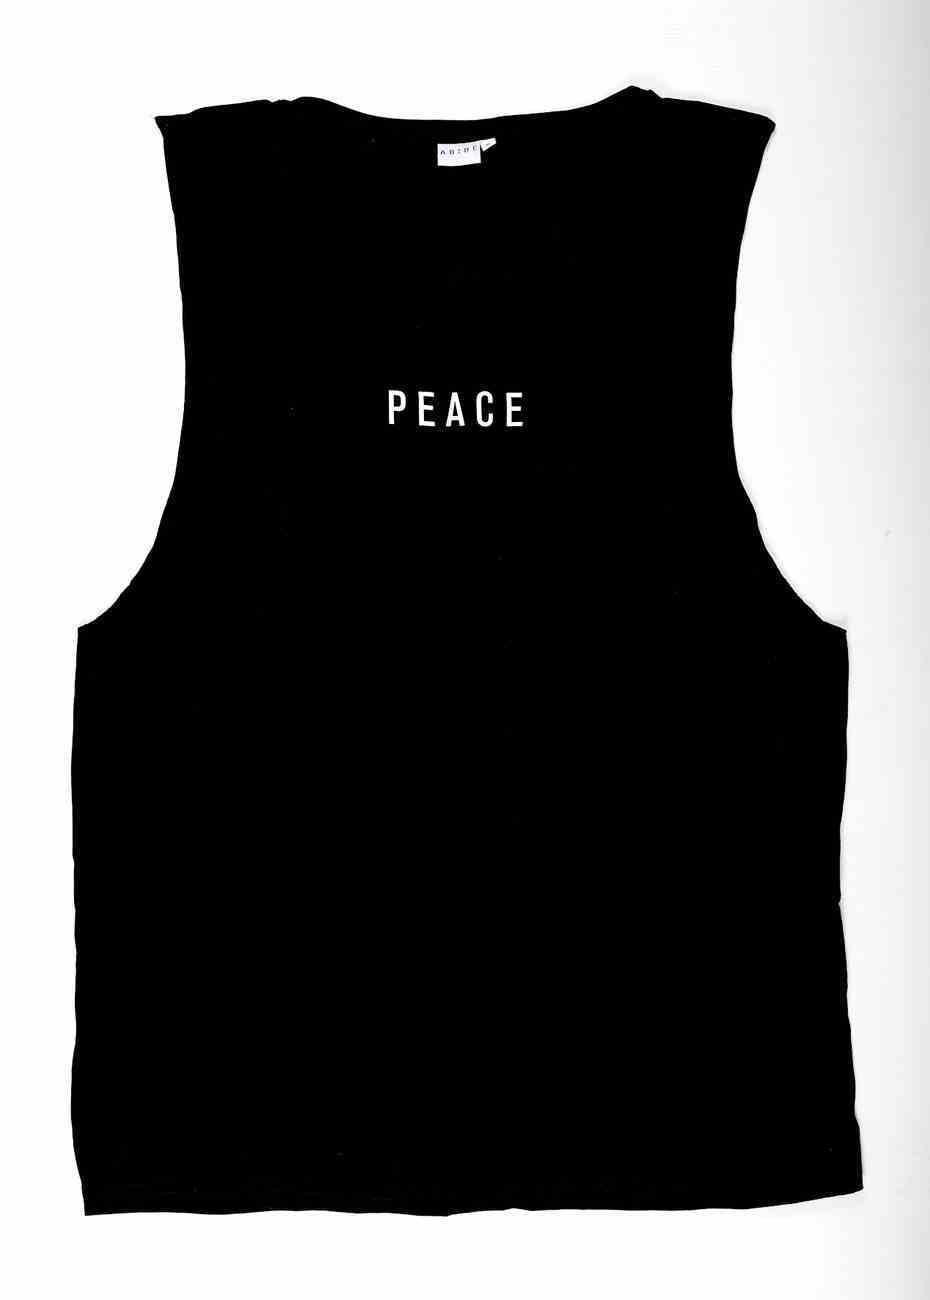 Mens Barnard Tank: Peace, Medium, Black With White Print (Abide T-shirt Apparel Series) Soft Goods